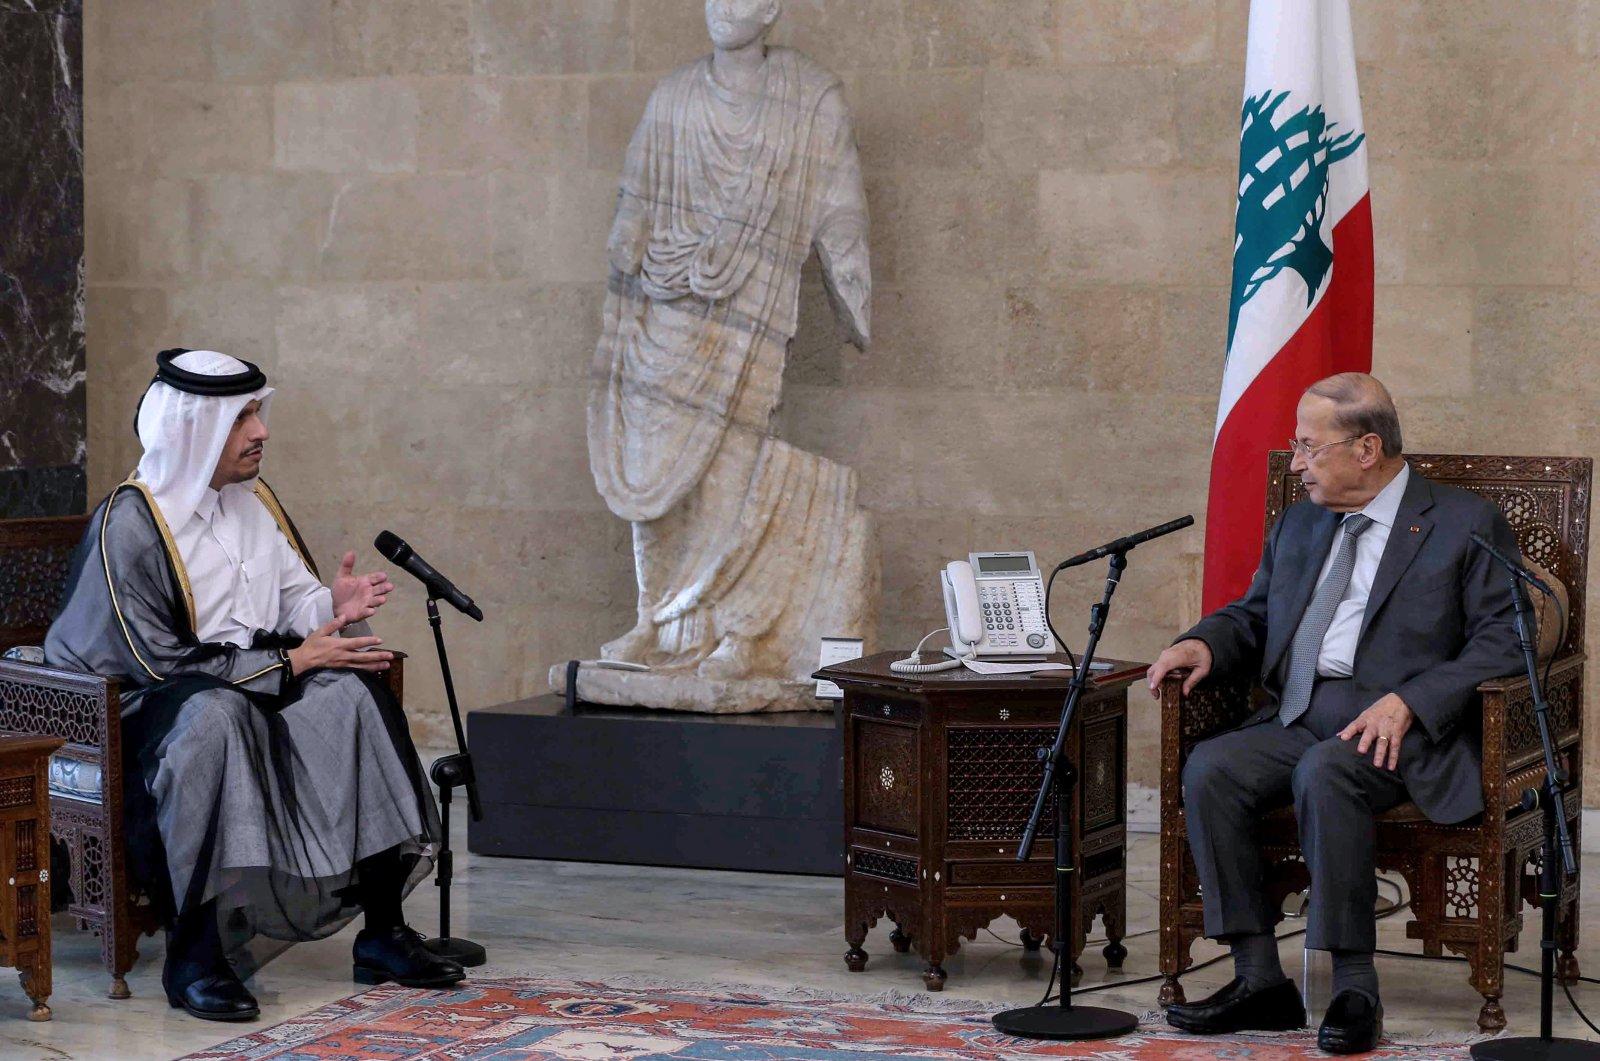 Lebanese President Michel Aoun (R) meets with Qatar's Foreign Minister Mohammad bin Abdulrahman Al Thani, in Beirut, Lebanon, July 6, 2021. (EPA Photo)